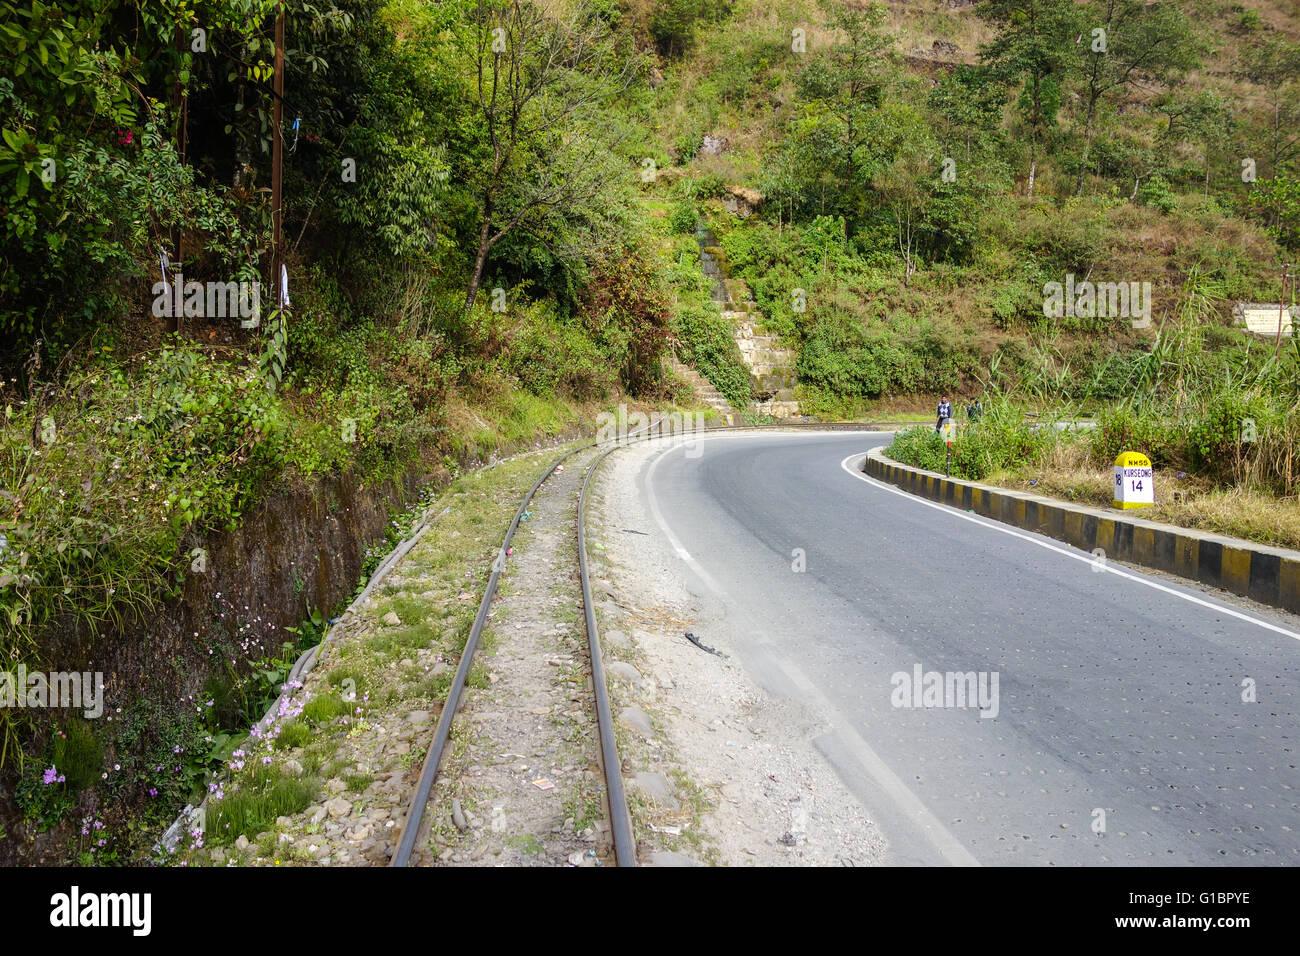 Darjeeling Himalayan Railway Toy Train track alongside National Highway 55 near Sonada, West Bengal, India Stock Photo